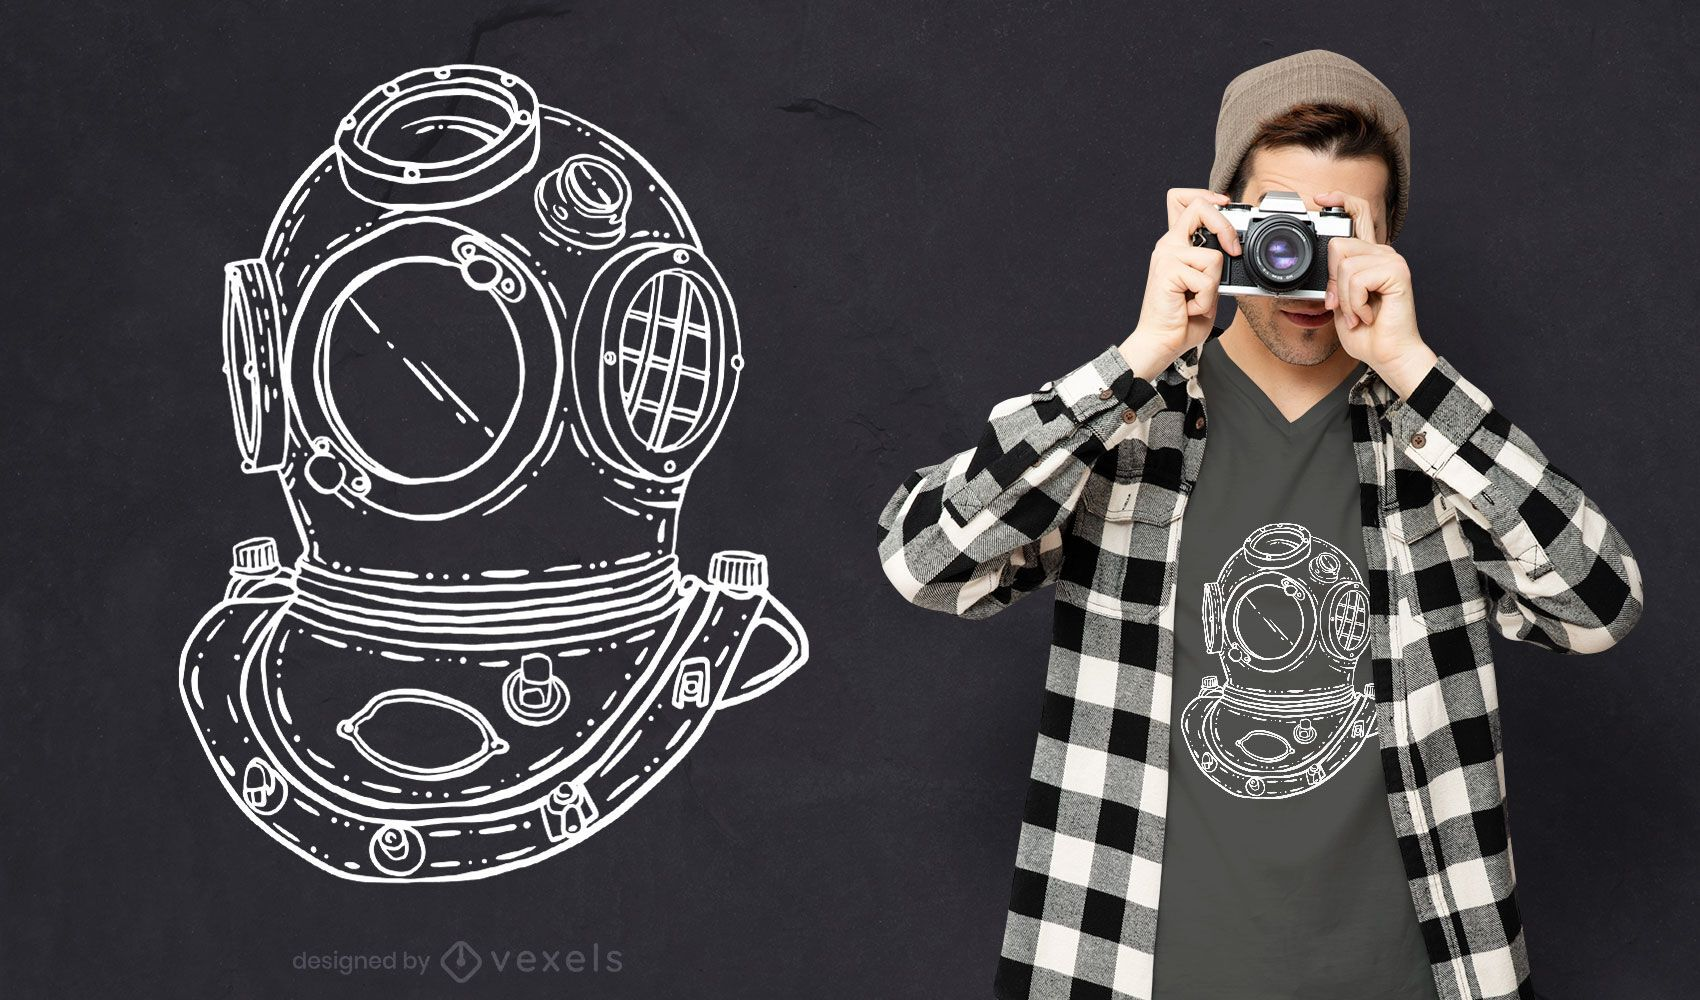 Diseño de camiseta dibujada a mano de casco de buceo.